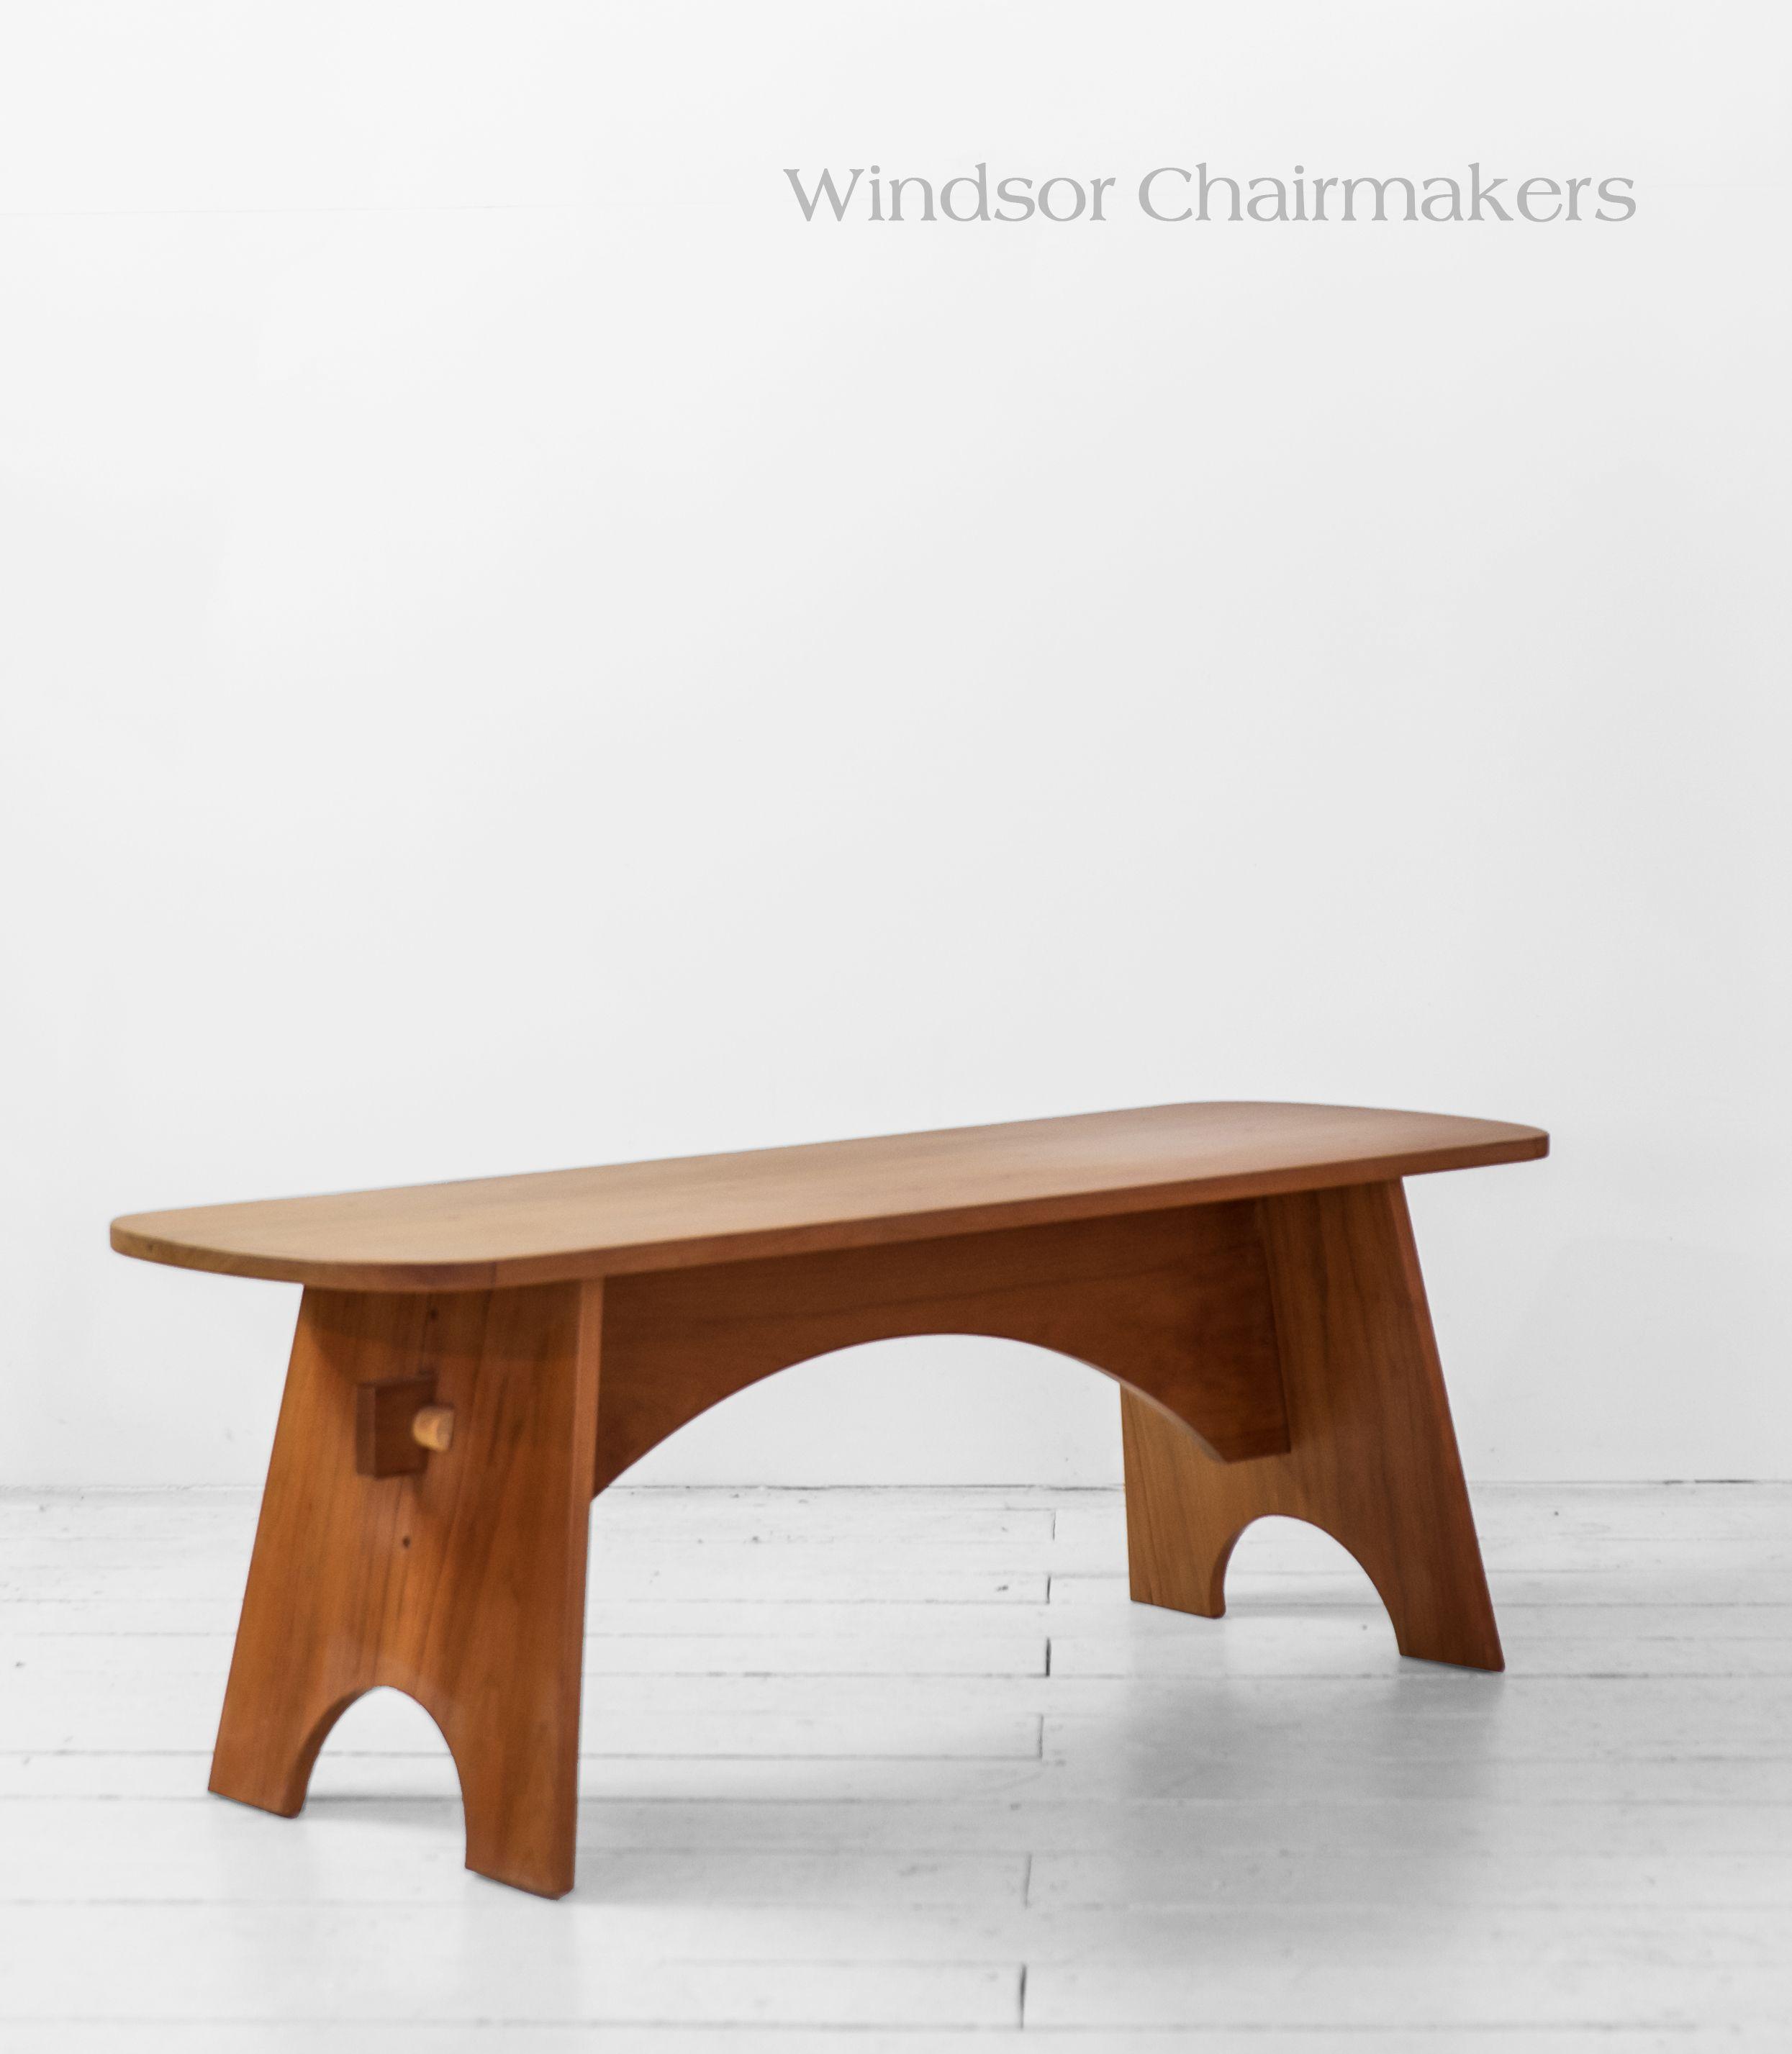 trestle copy hills mission furniture fine benches handmade bench amish shop